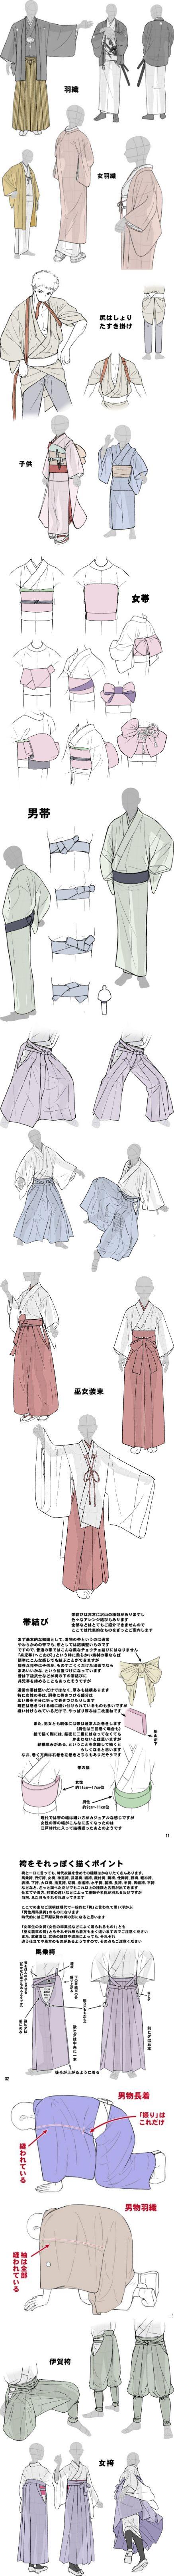 ▼The Kimono Gallery http://thekimonogallery.tumblr.com/post/126997932680/tanuki-kimono-kimono-drawing-guide-22-by